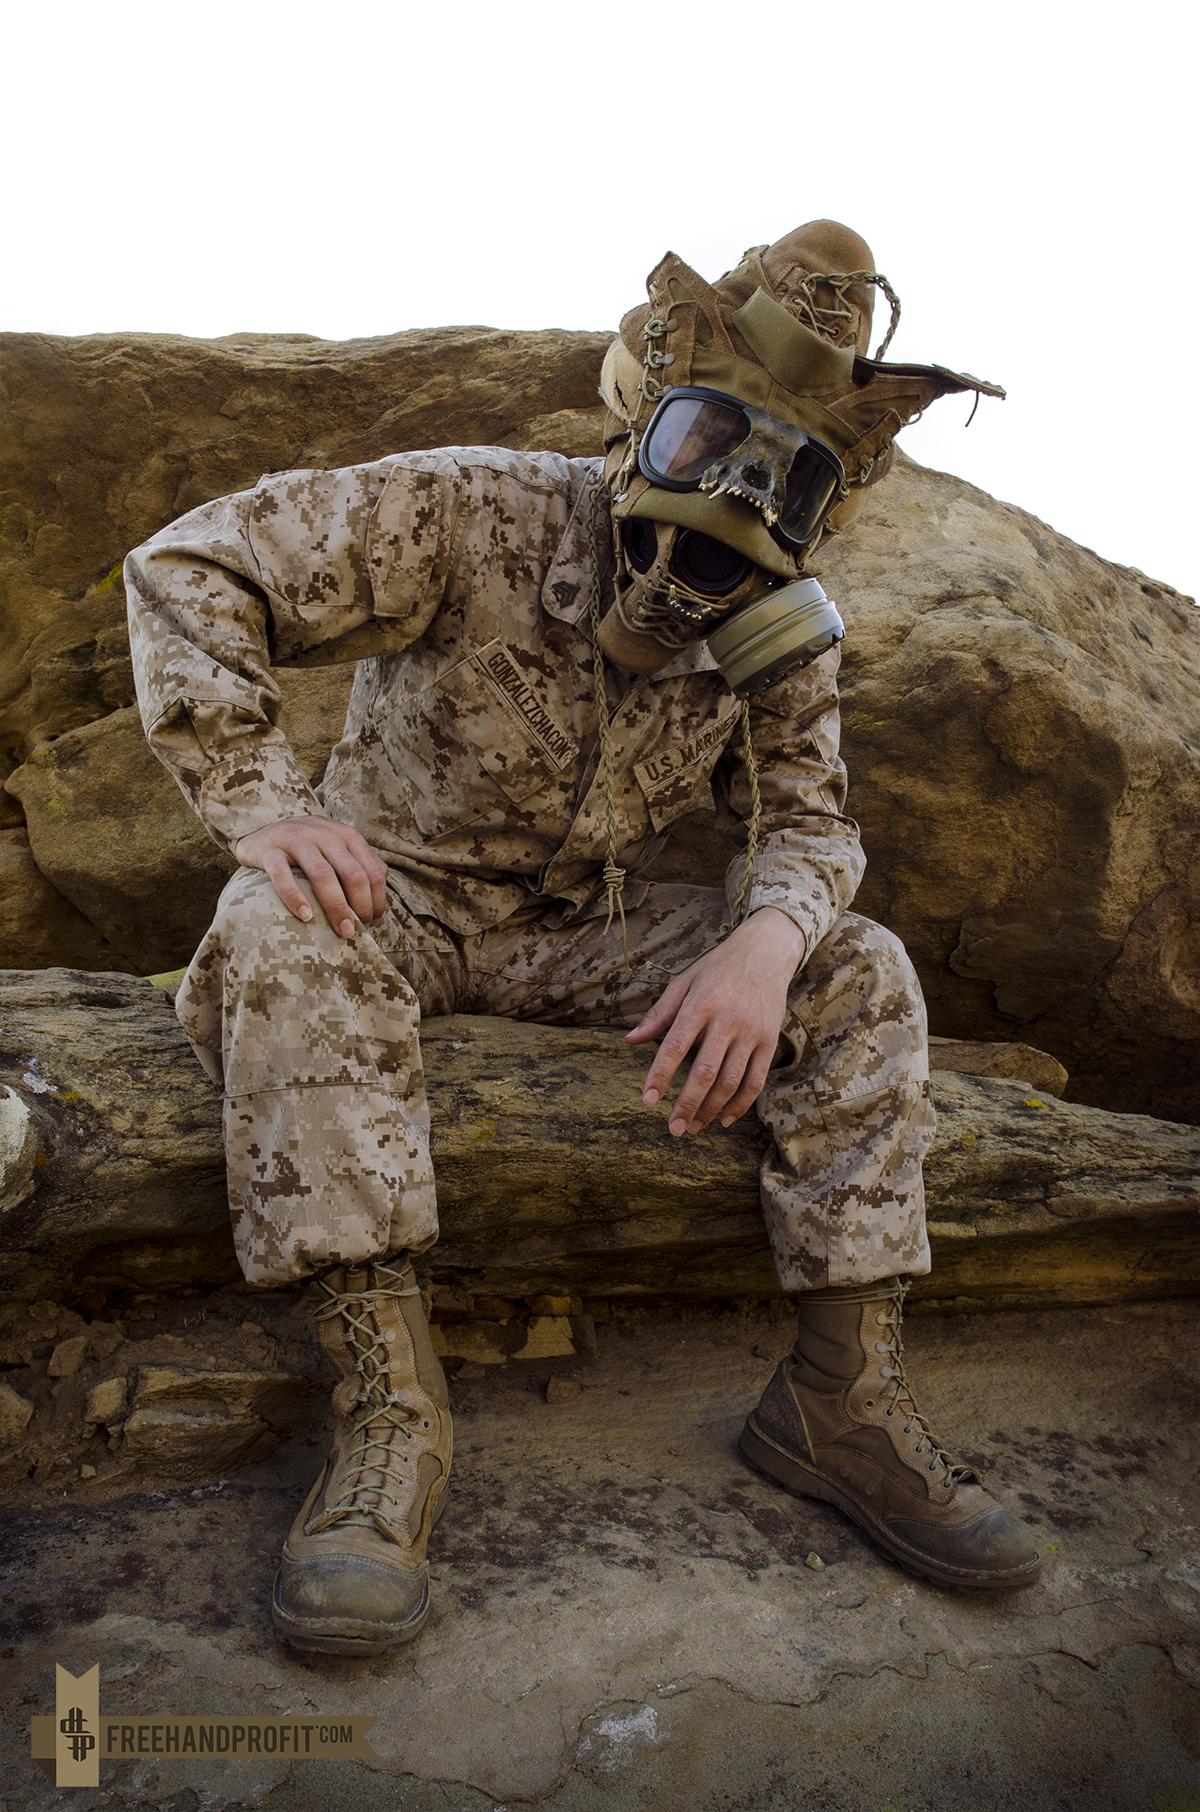 USMC Combat Book Gas Mask – THE BLOG : FREEHANDPROFIT.com